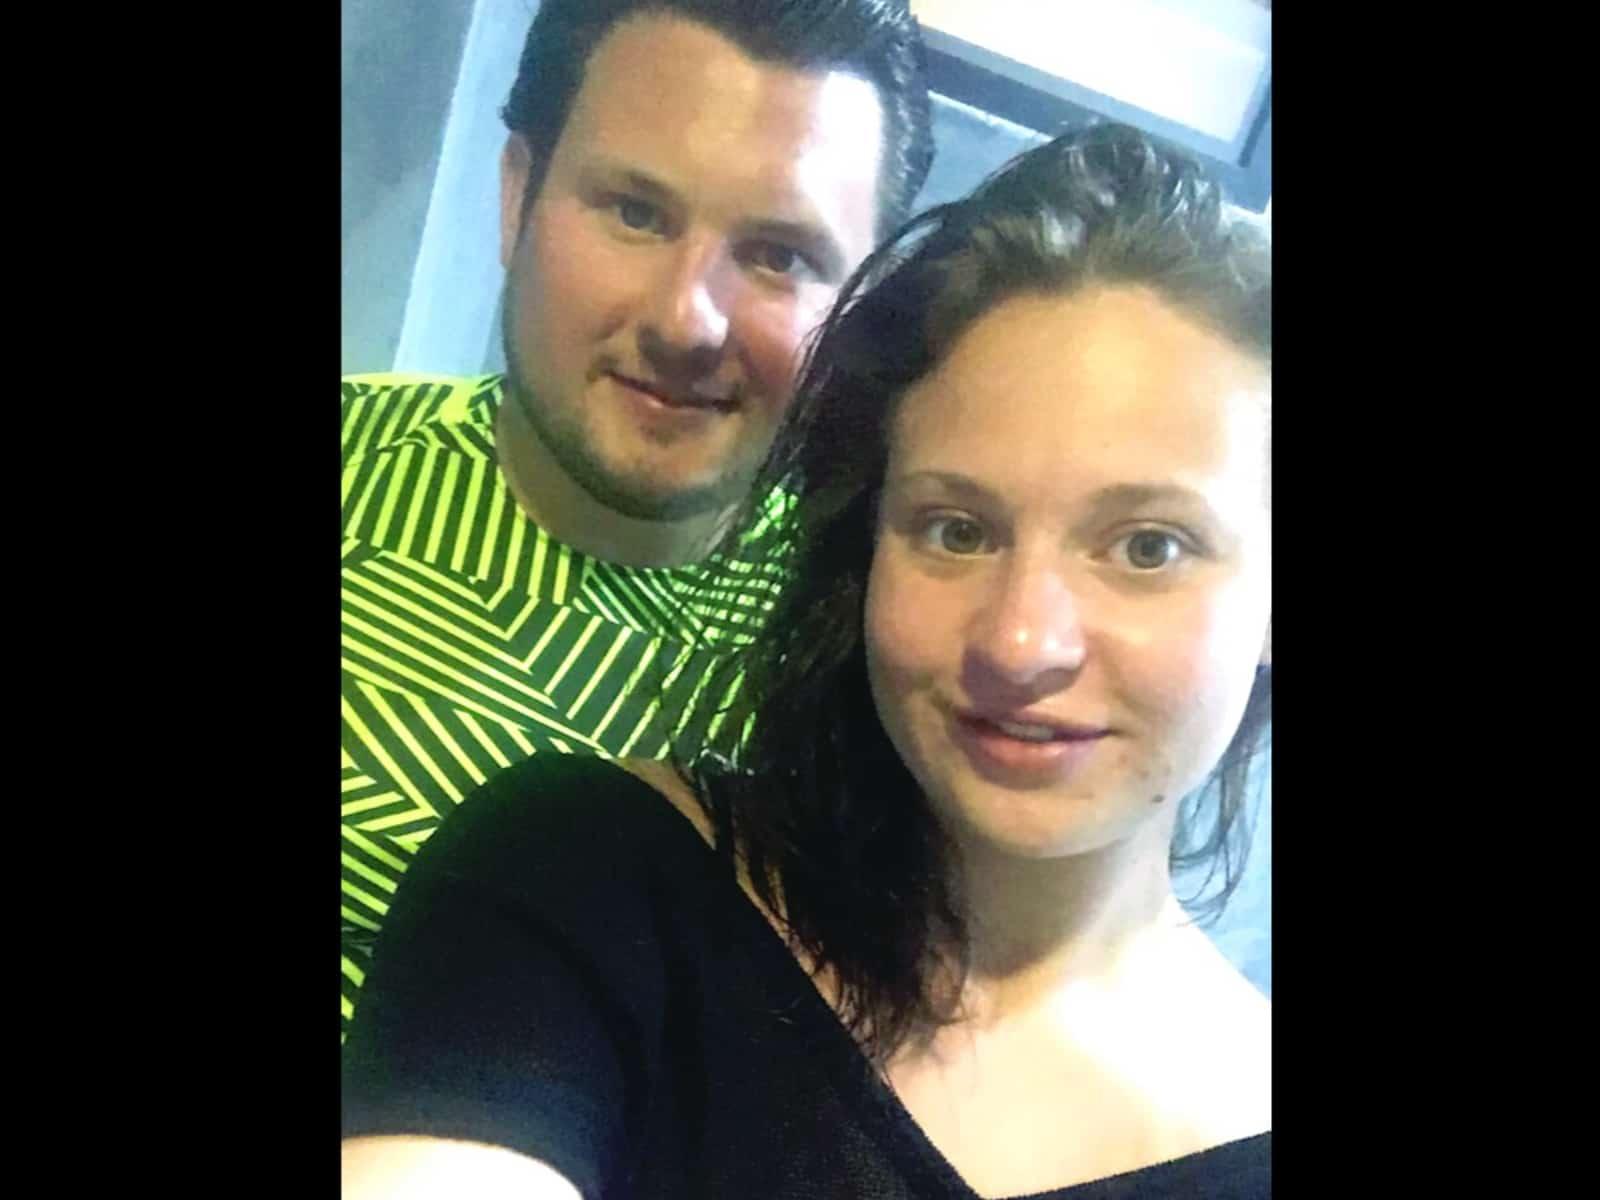 Andrew & Phoebe from Shepparton, Victoria, Australia